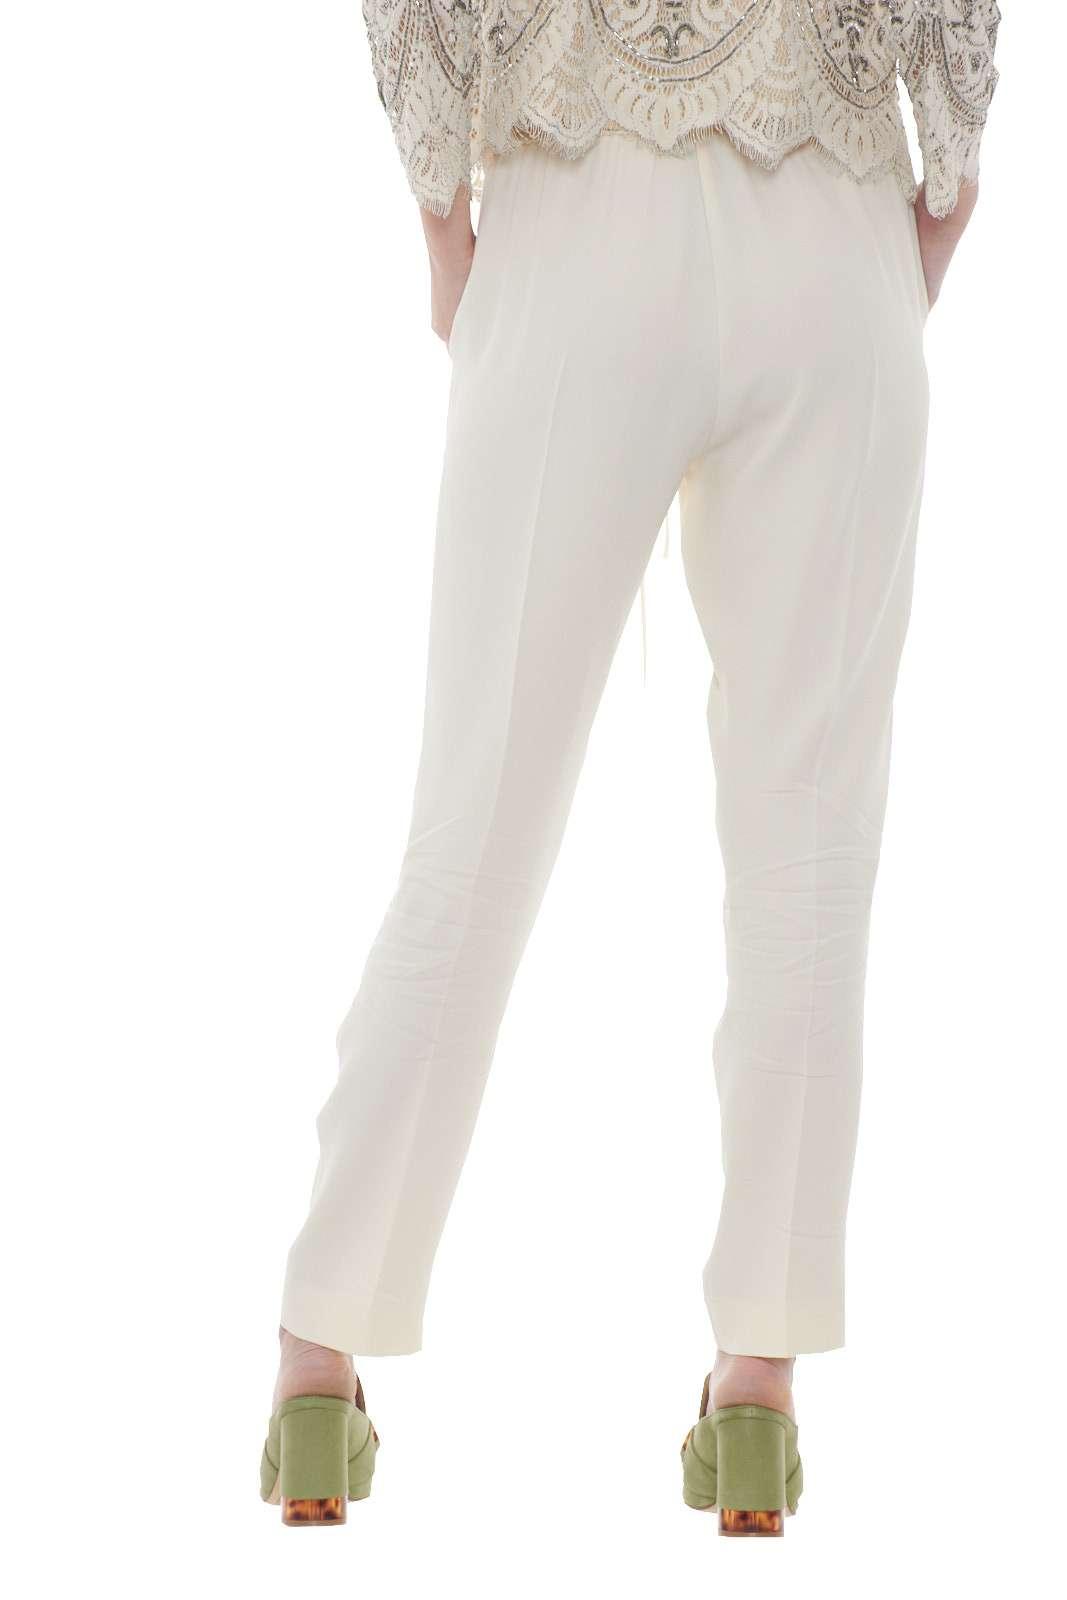 https://www.parmax.com/media/catalog/product/a/i/PE-outlet_parmax-pantaloni-donna-TwinSet-201TP2431-C.jpg